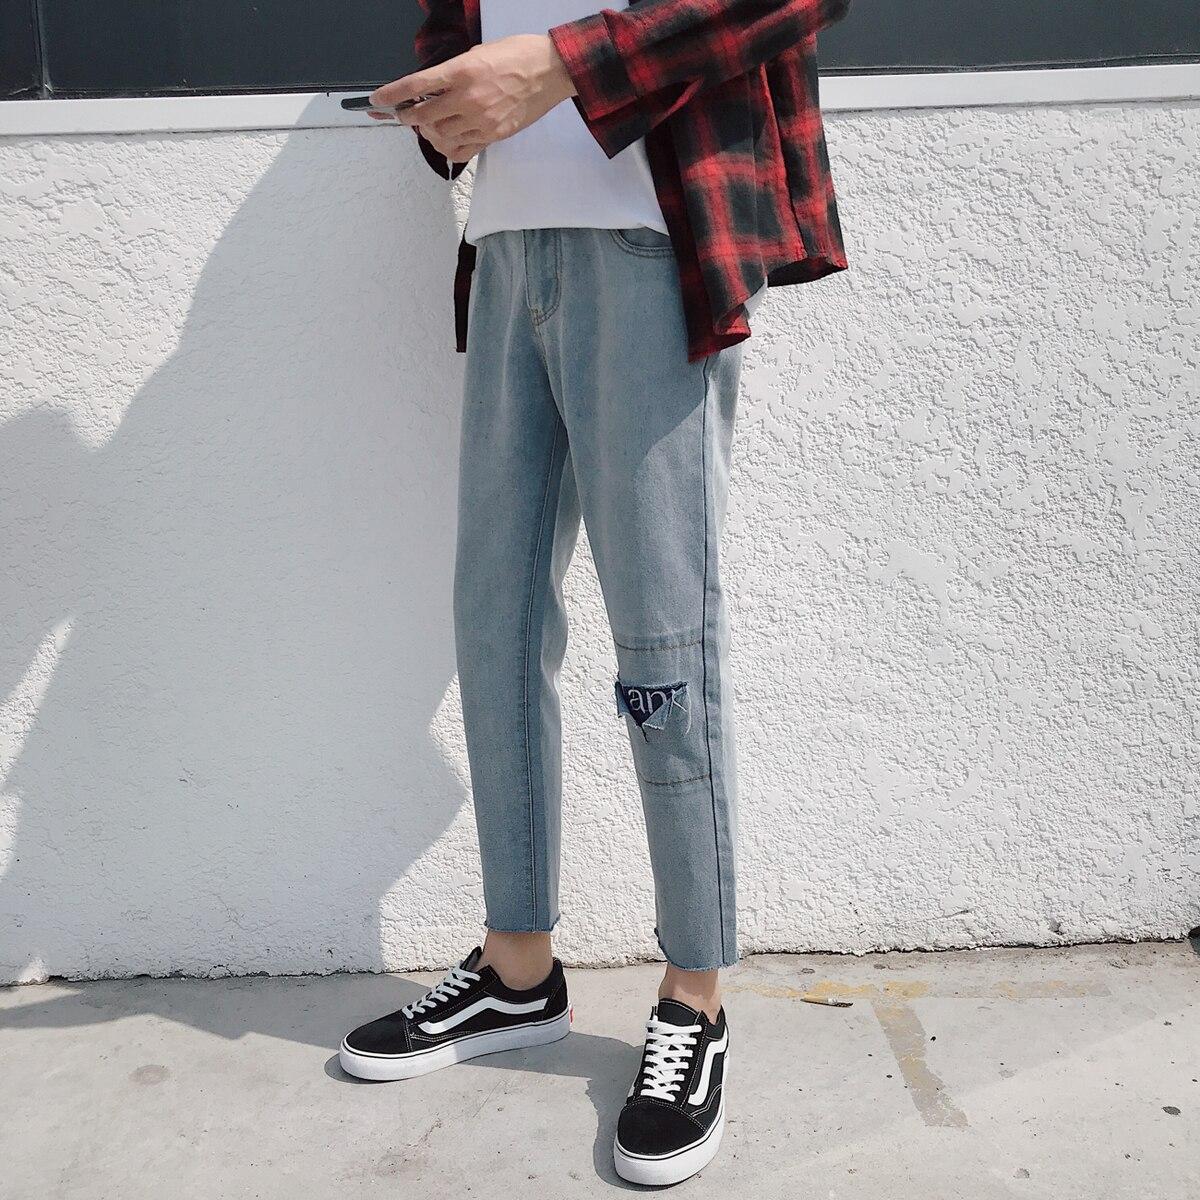 2018 Spring New Mens Fashion Applique Decoration Holes Denim Ninth Pants Stretch Slim Casual Solid Color Jeans Trousers 28-33